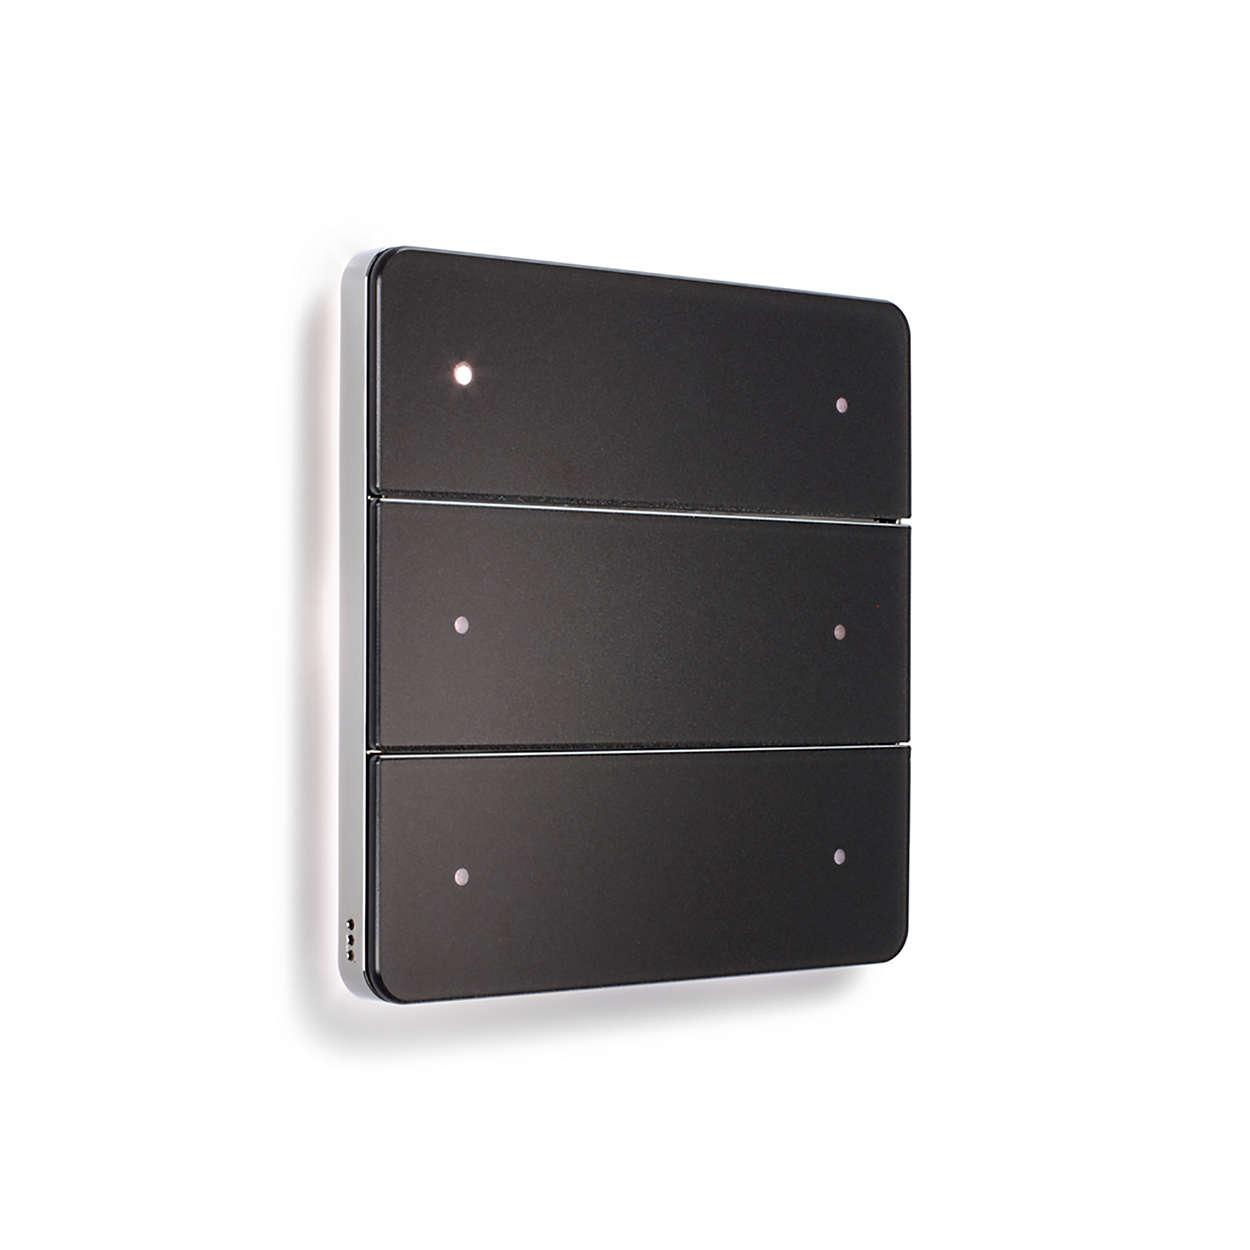 Klávesnica Antumbra iColor Keypad